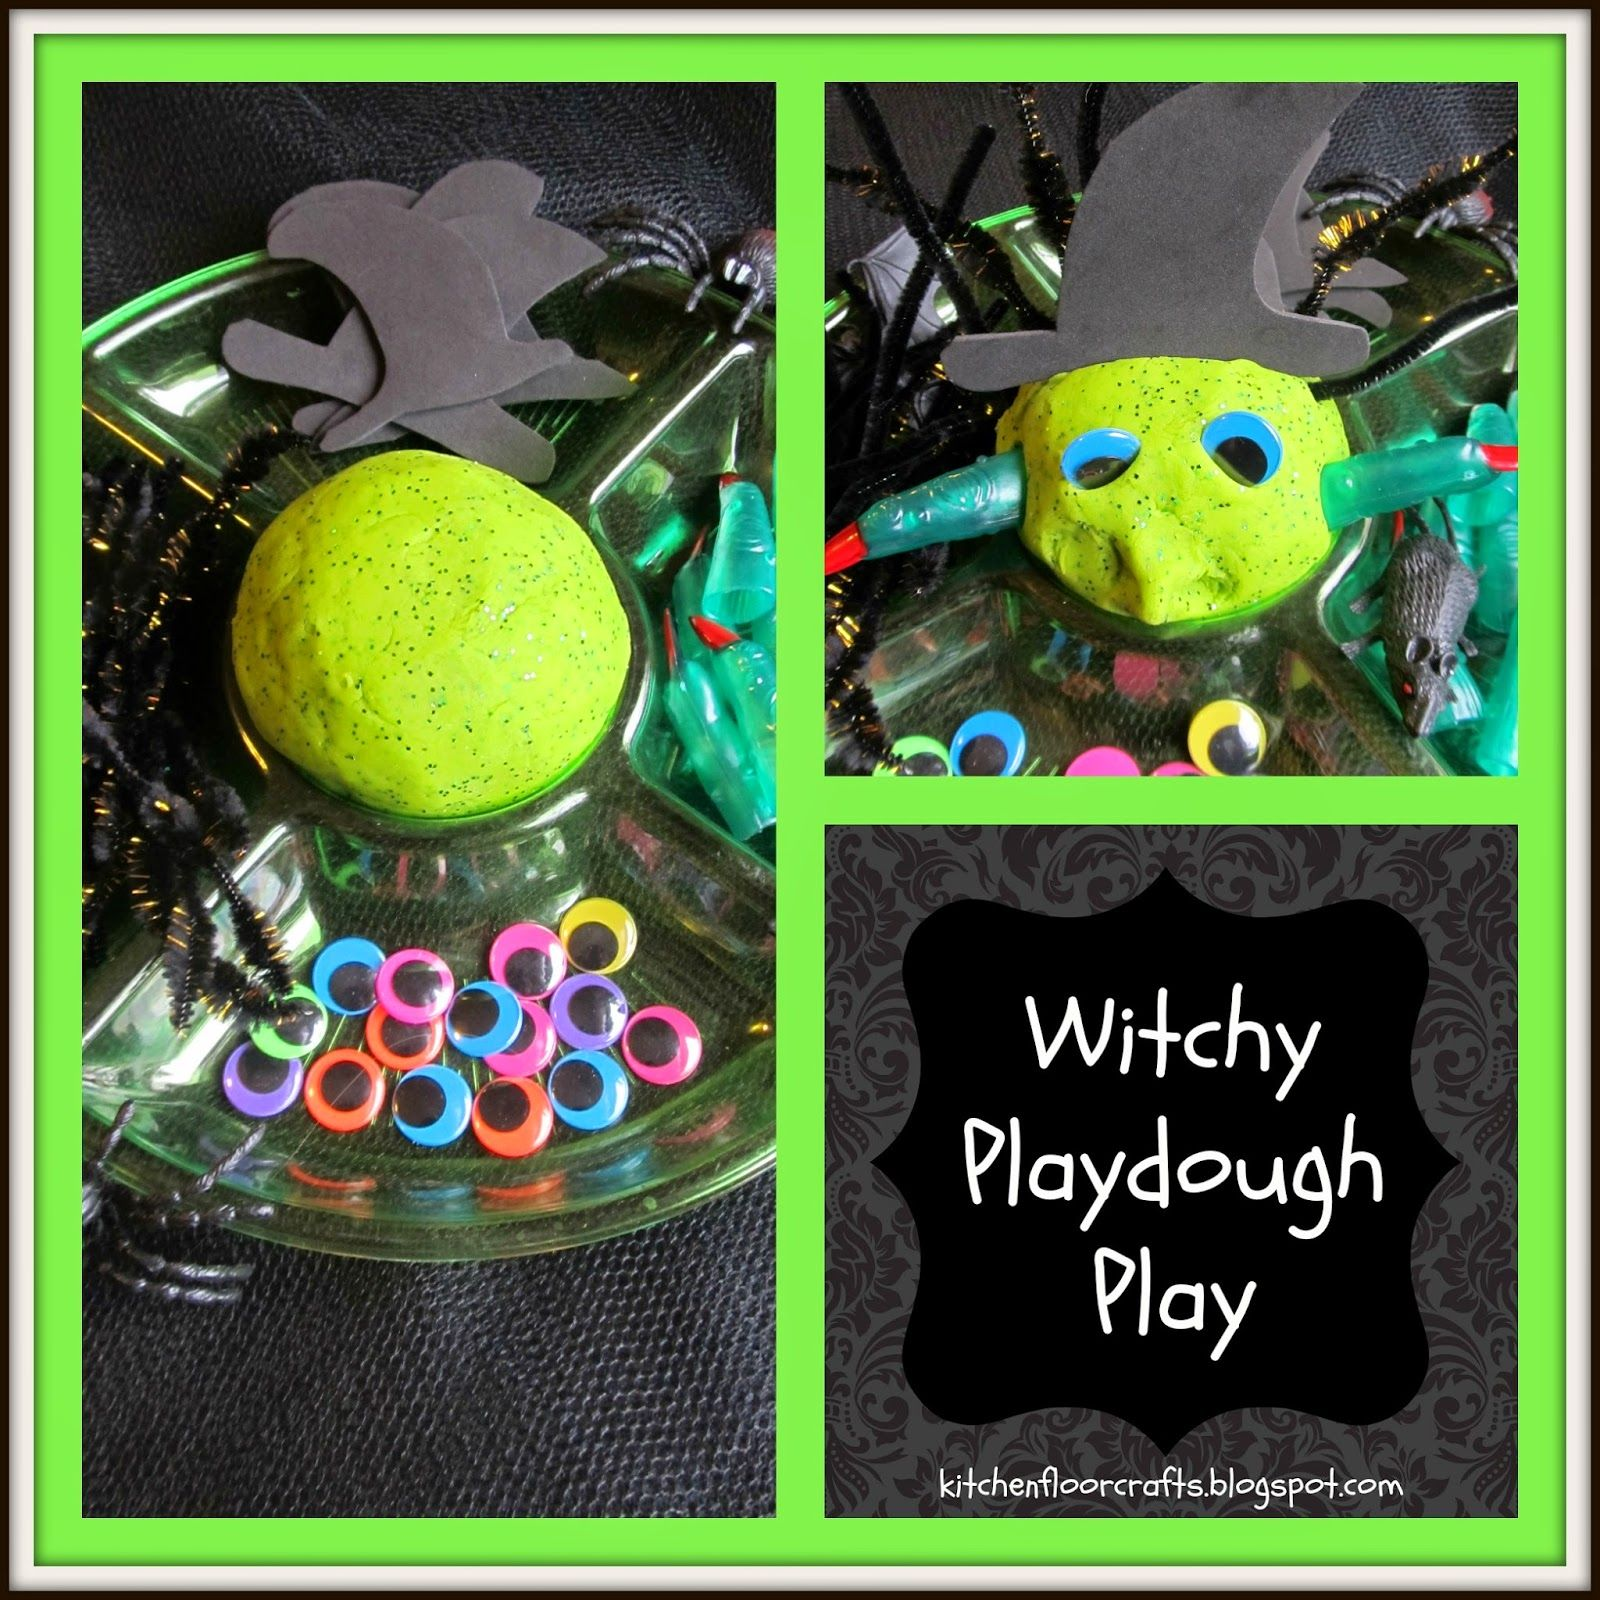 Messy Kitchen Floor Plan: Kitchen Floor Crafts: Witchy Playdough Play